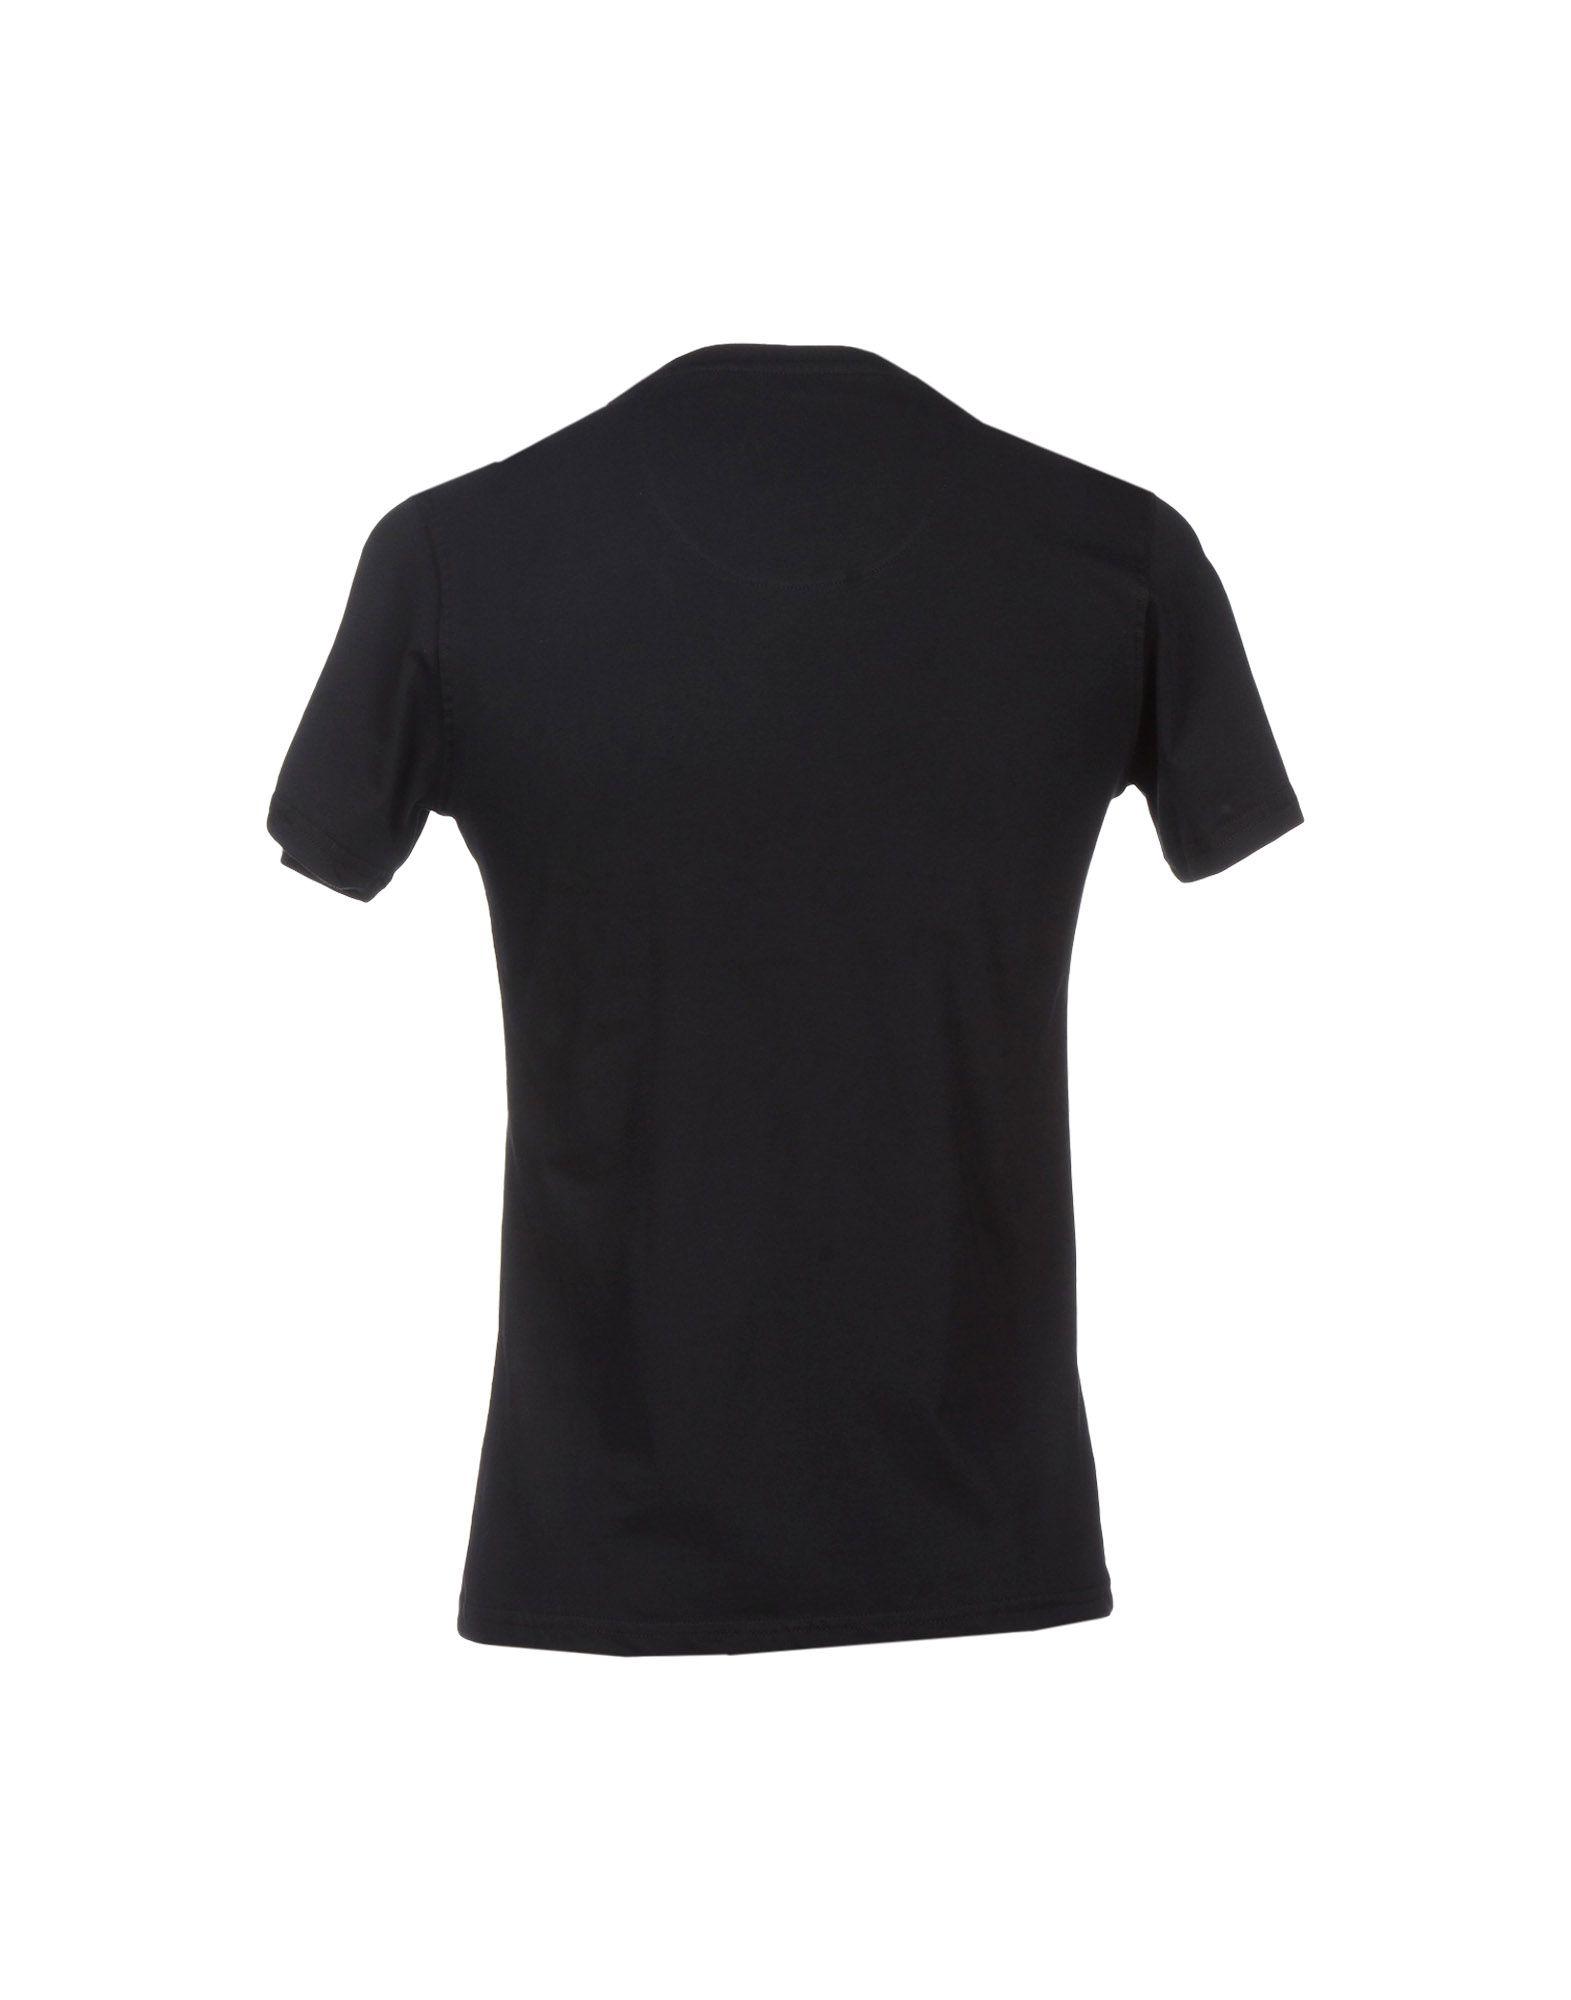 Philipp Plein T Shirt In Black For Men Lyst